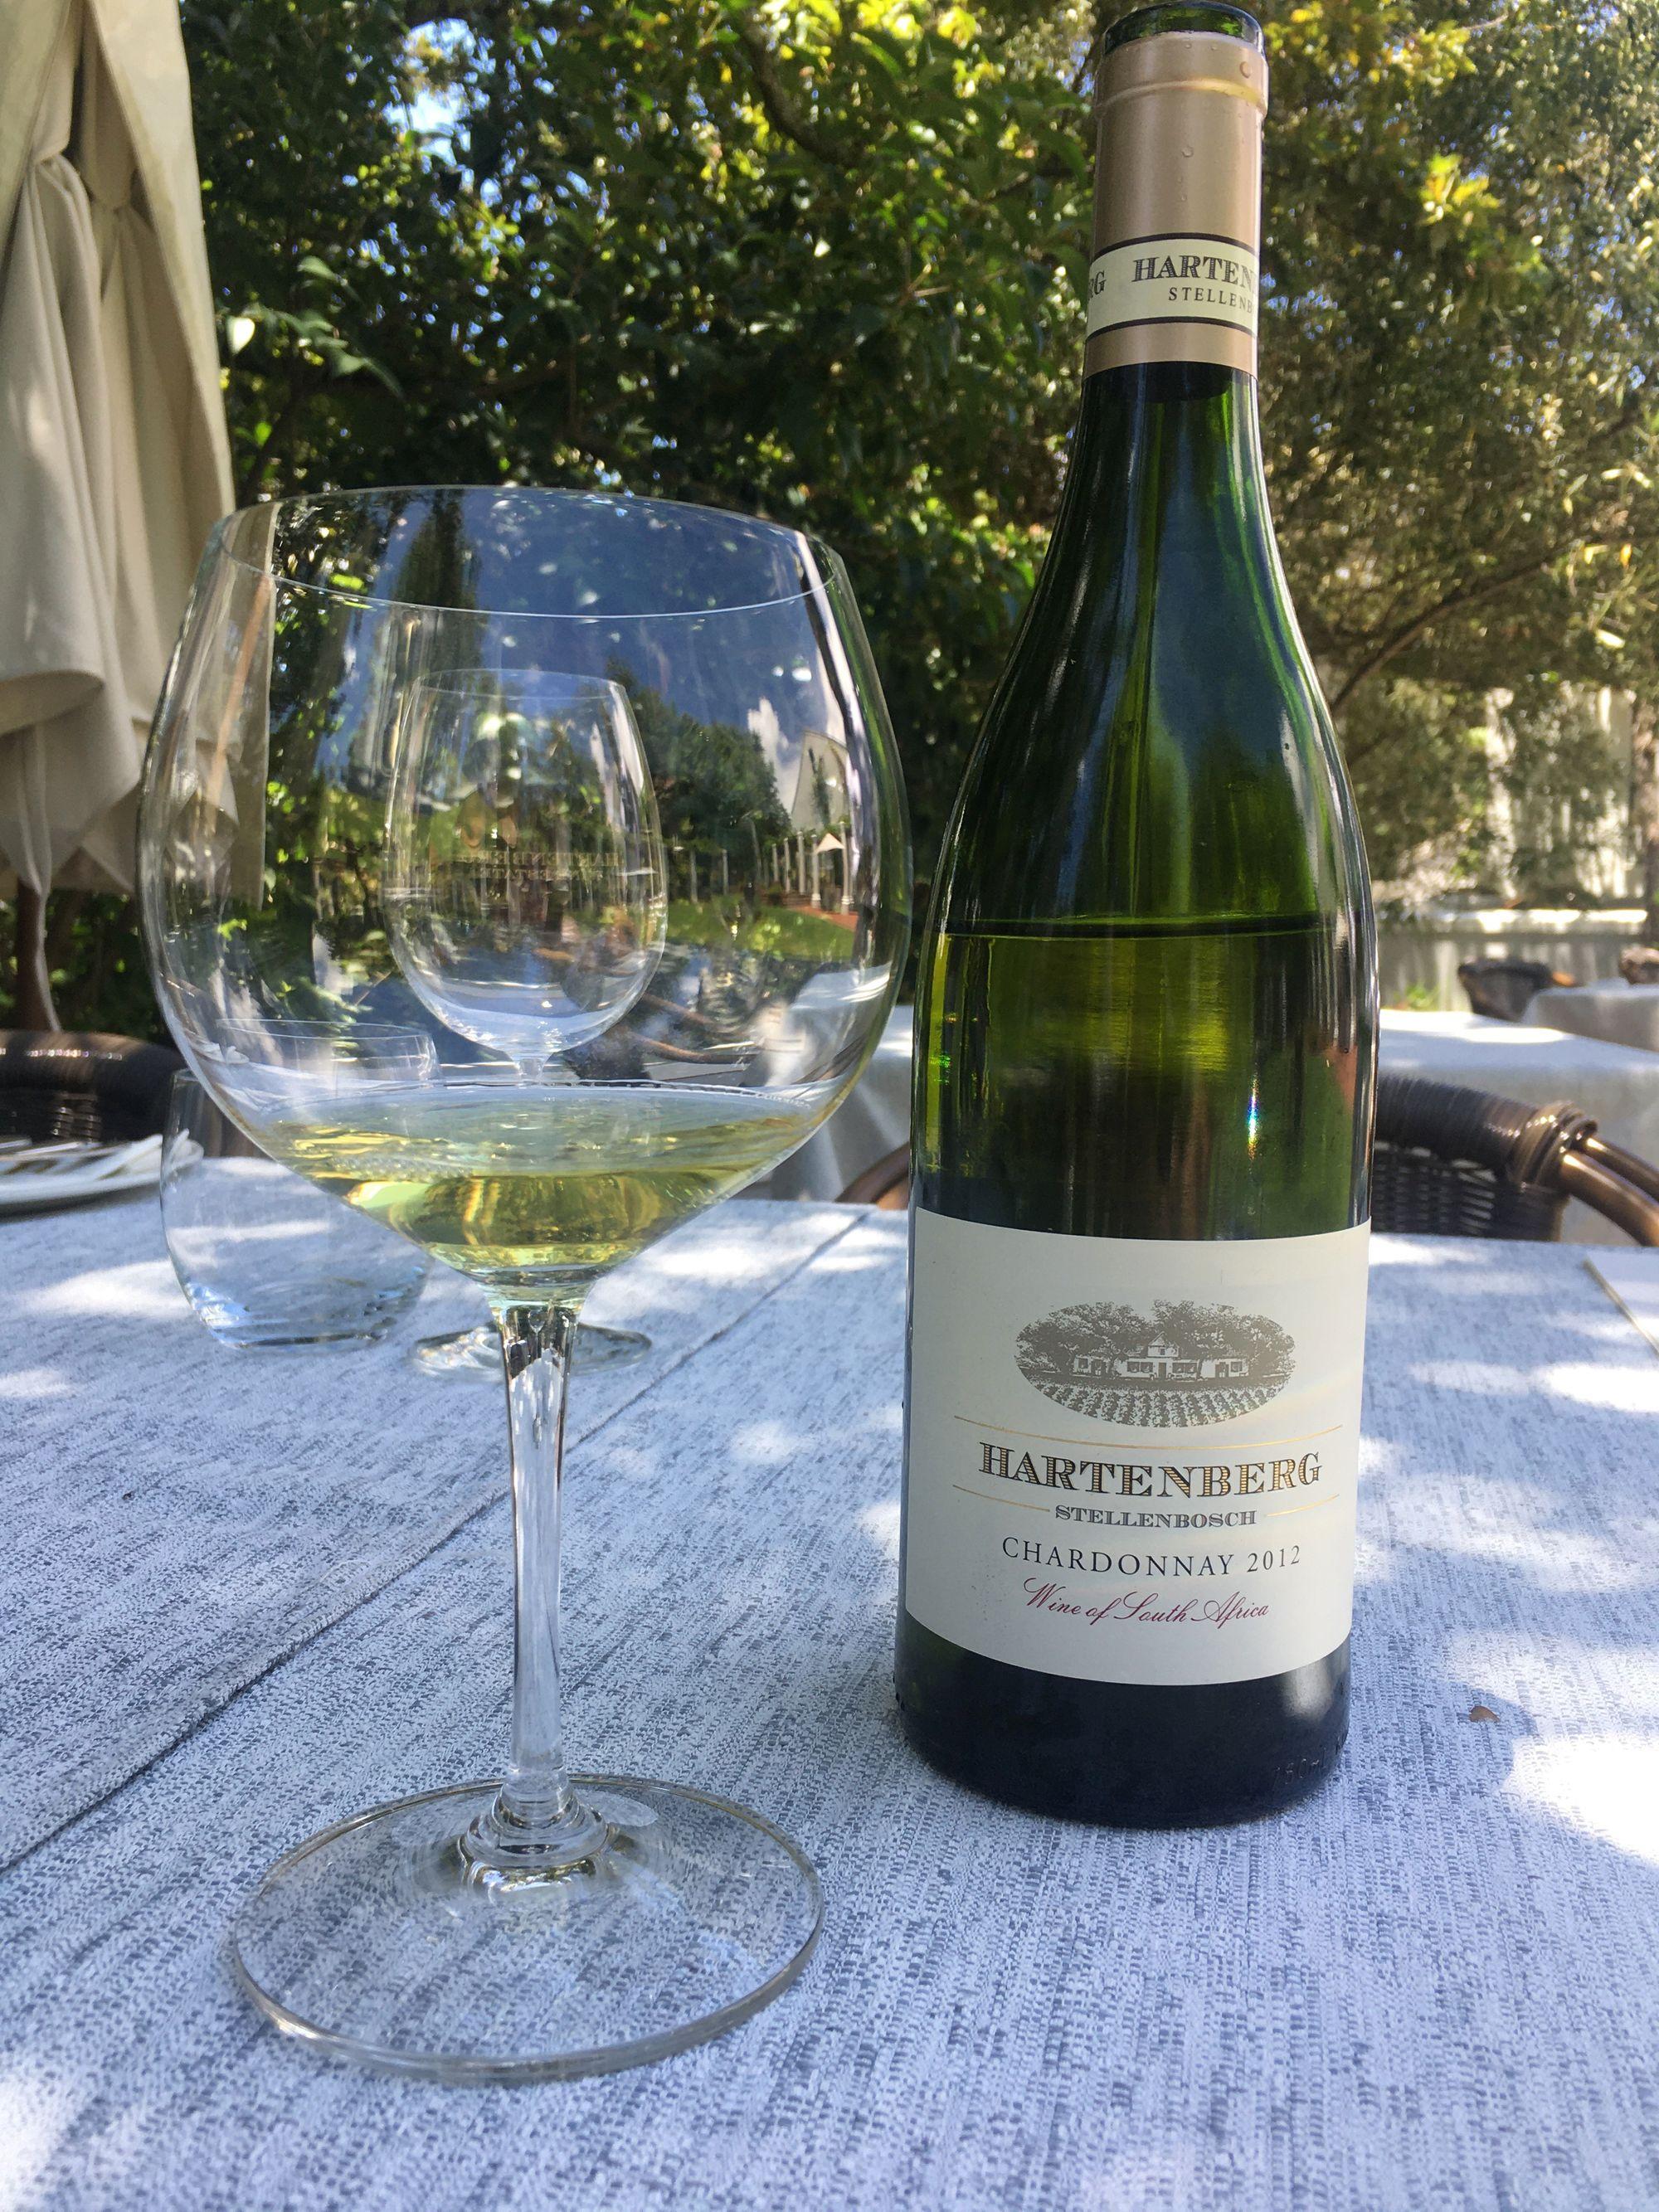 Hartenberg Chardonnay 2012